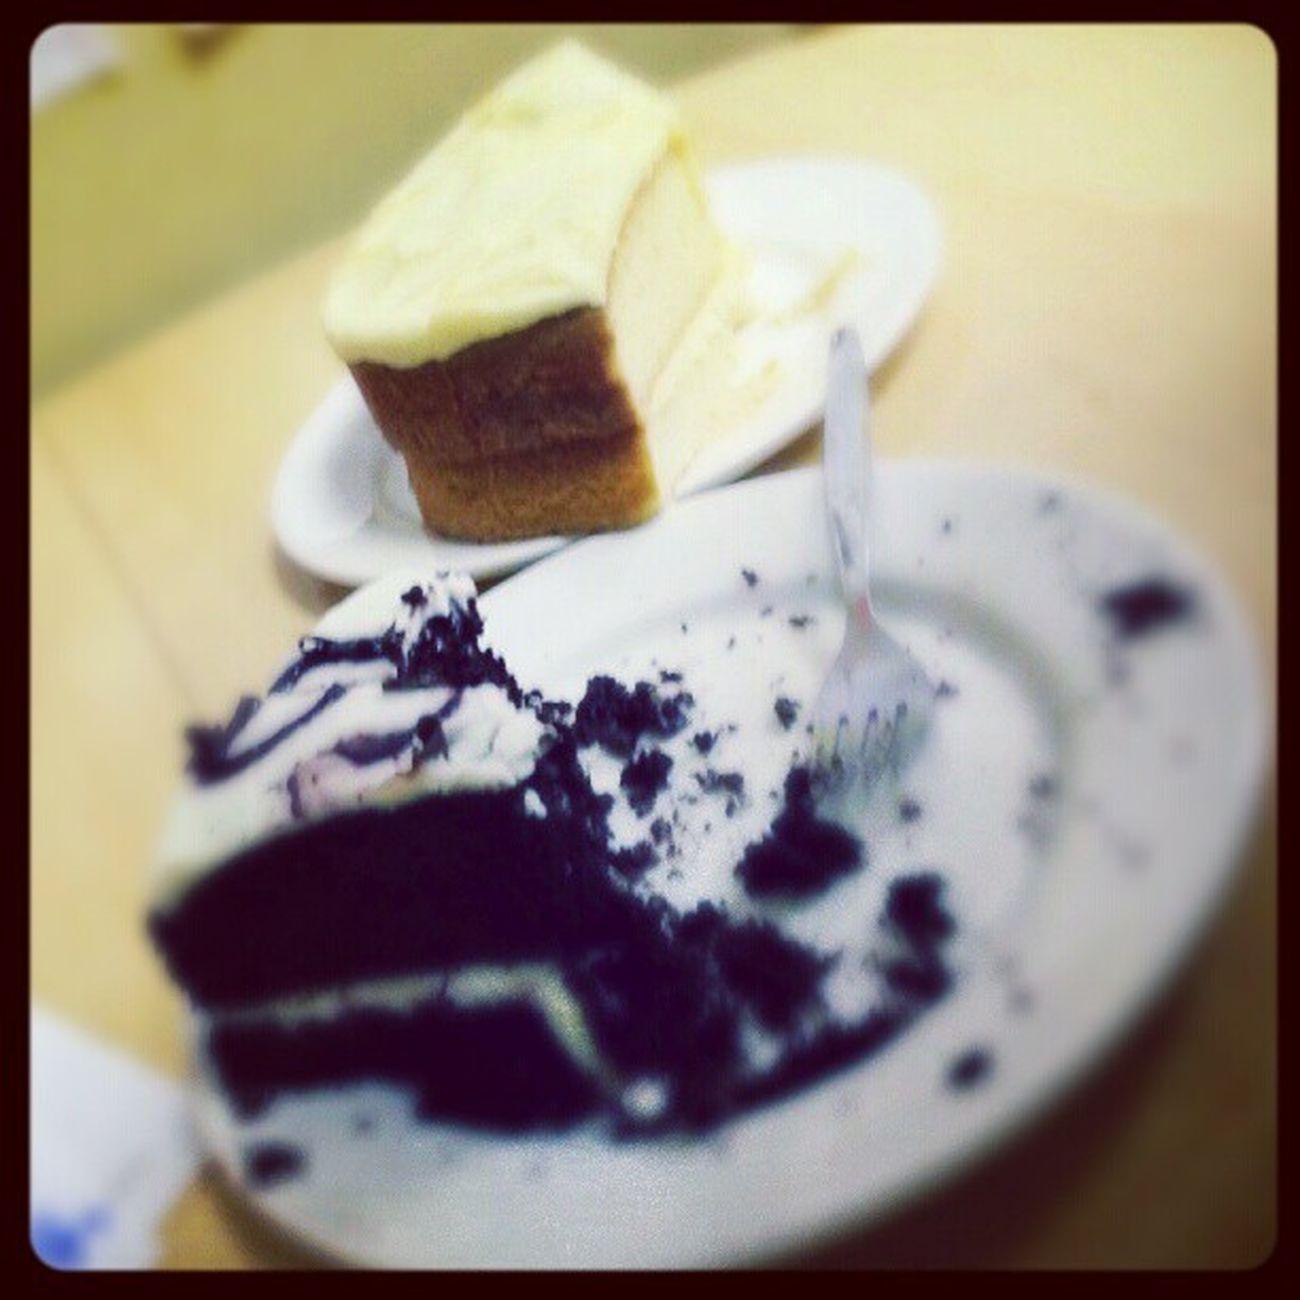 Sooooo this is s little bit awkward... Blackforestcake Lemoncake Mummy Cake Sexytime Hungrybeast Stuffmyface Allgone Gutted